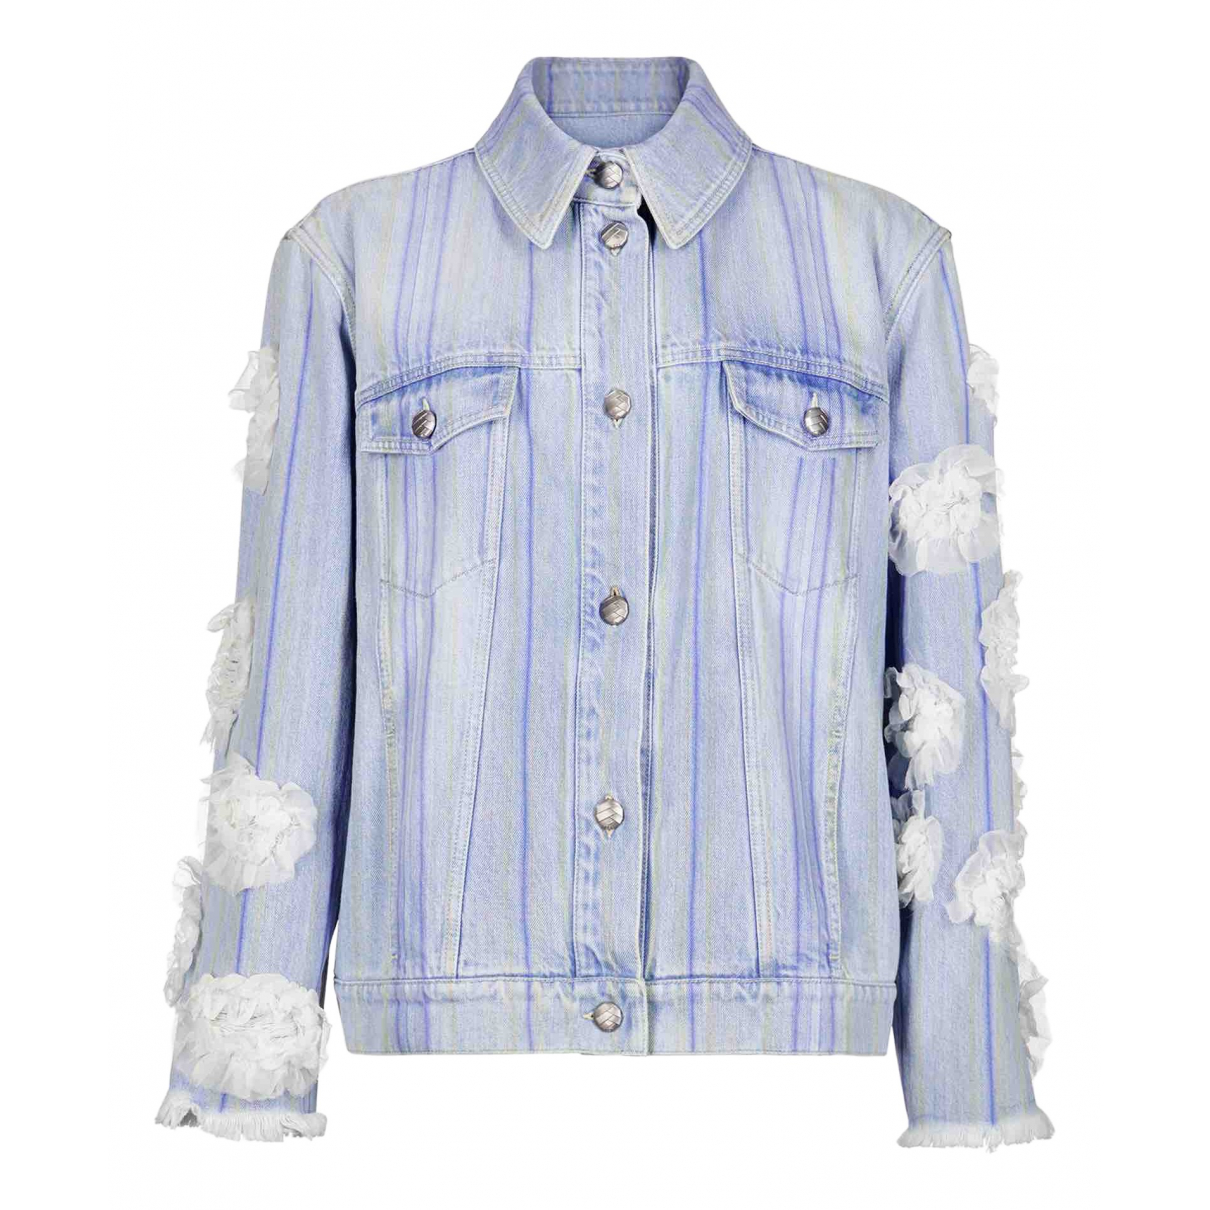 Chanel \N Blue Denim - Jeans jacket for Women L International